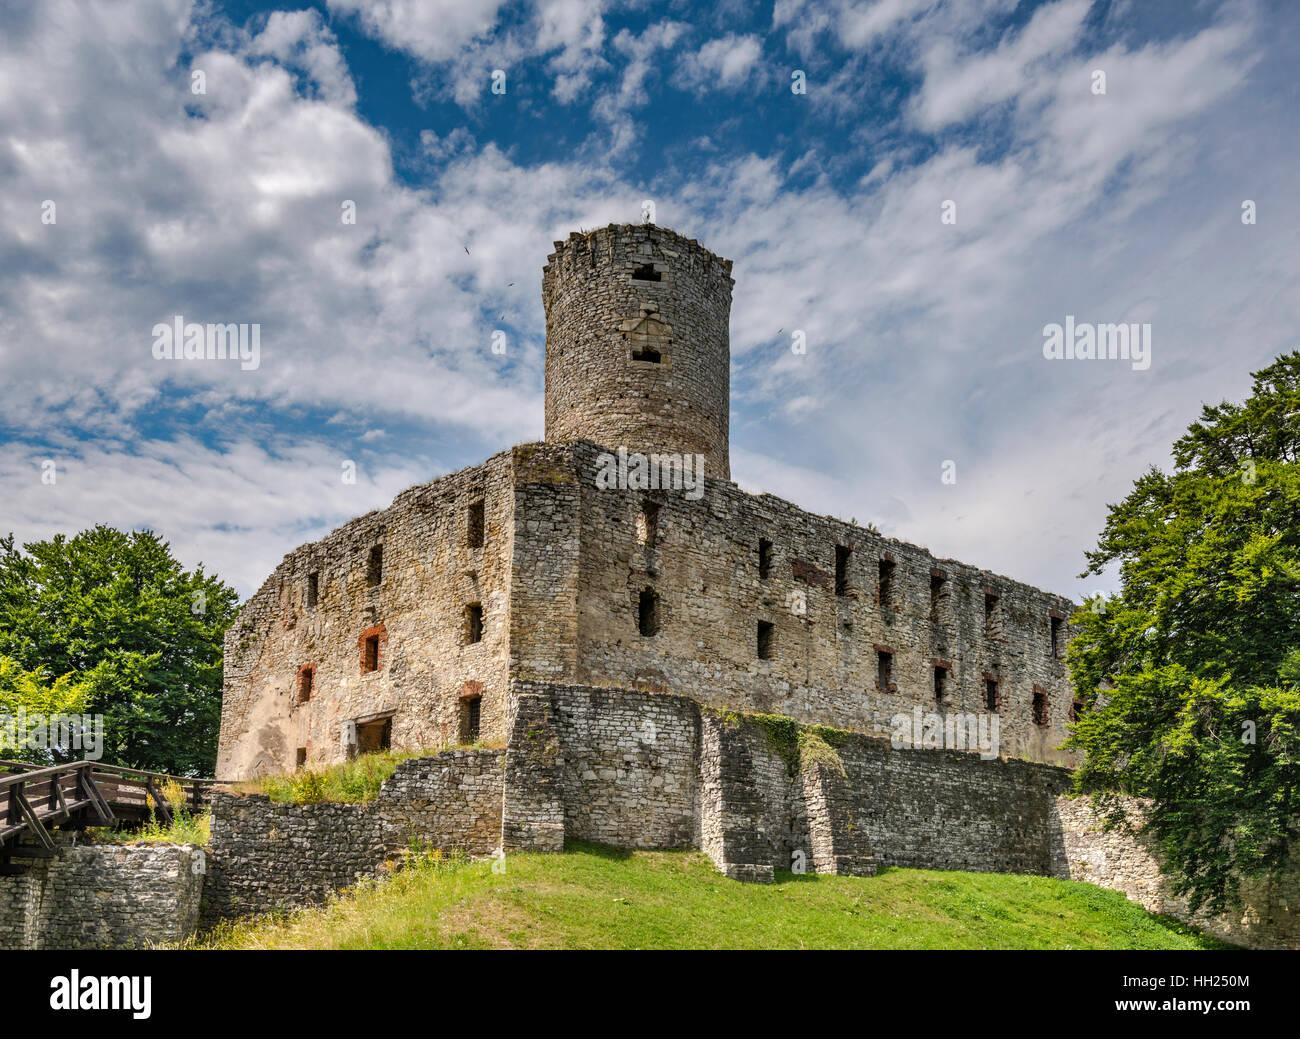 Lipowiec Castle near Babice, Malopolska, Poland - Stock Image